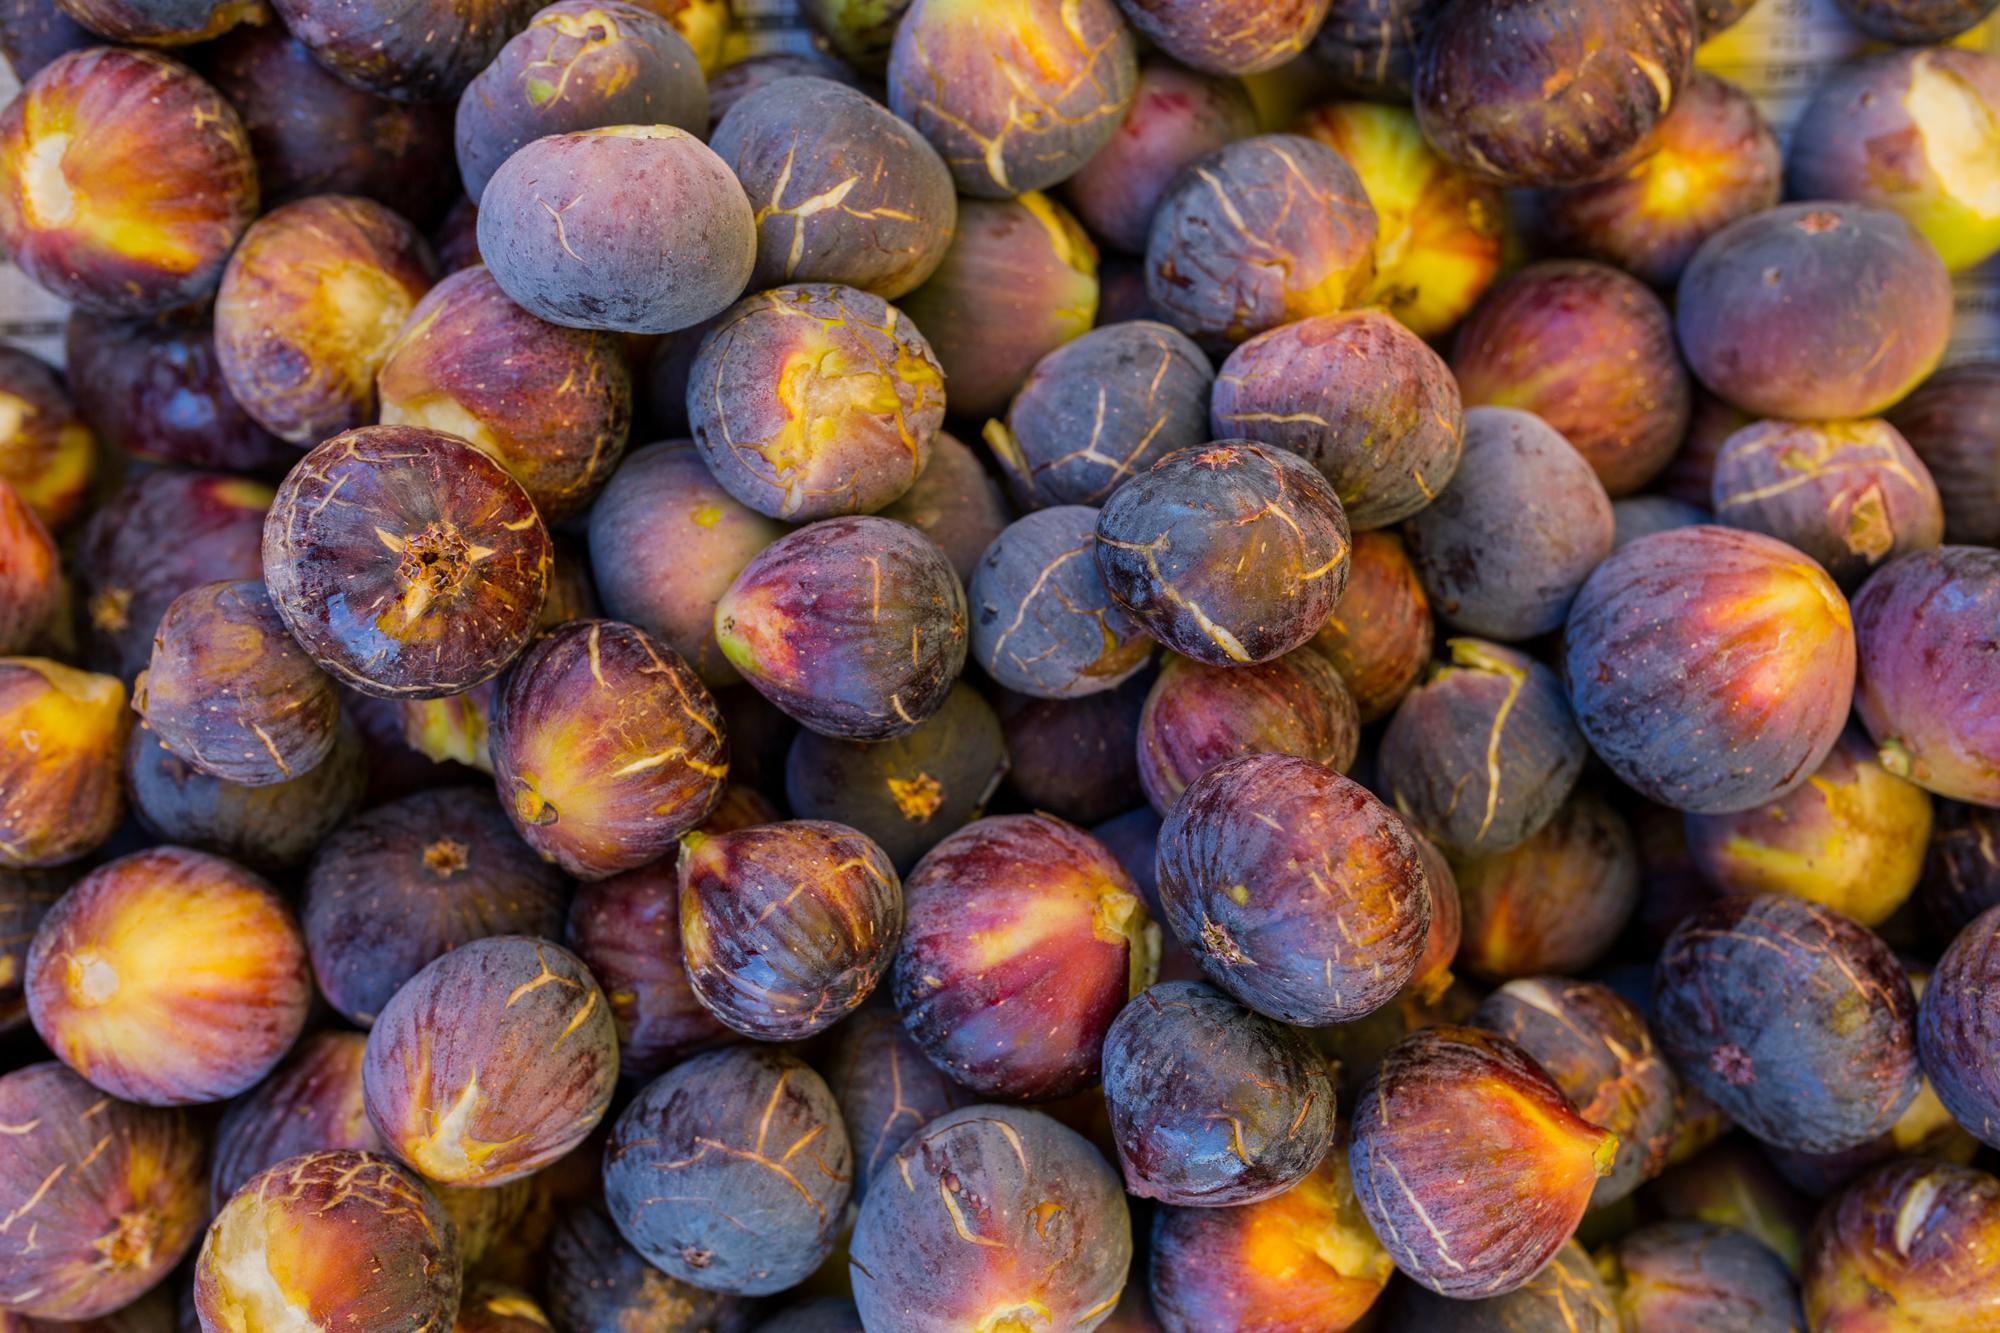 Figs in Albania.